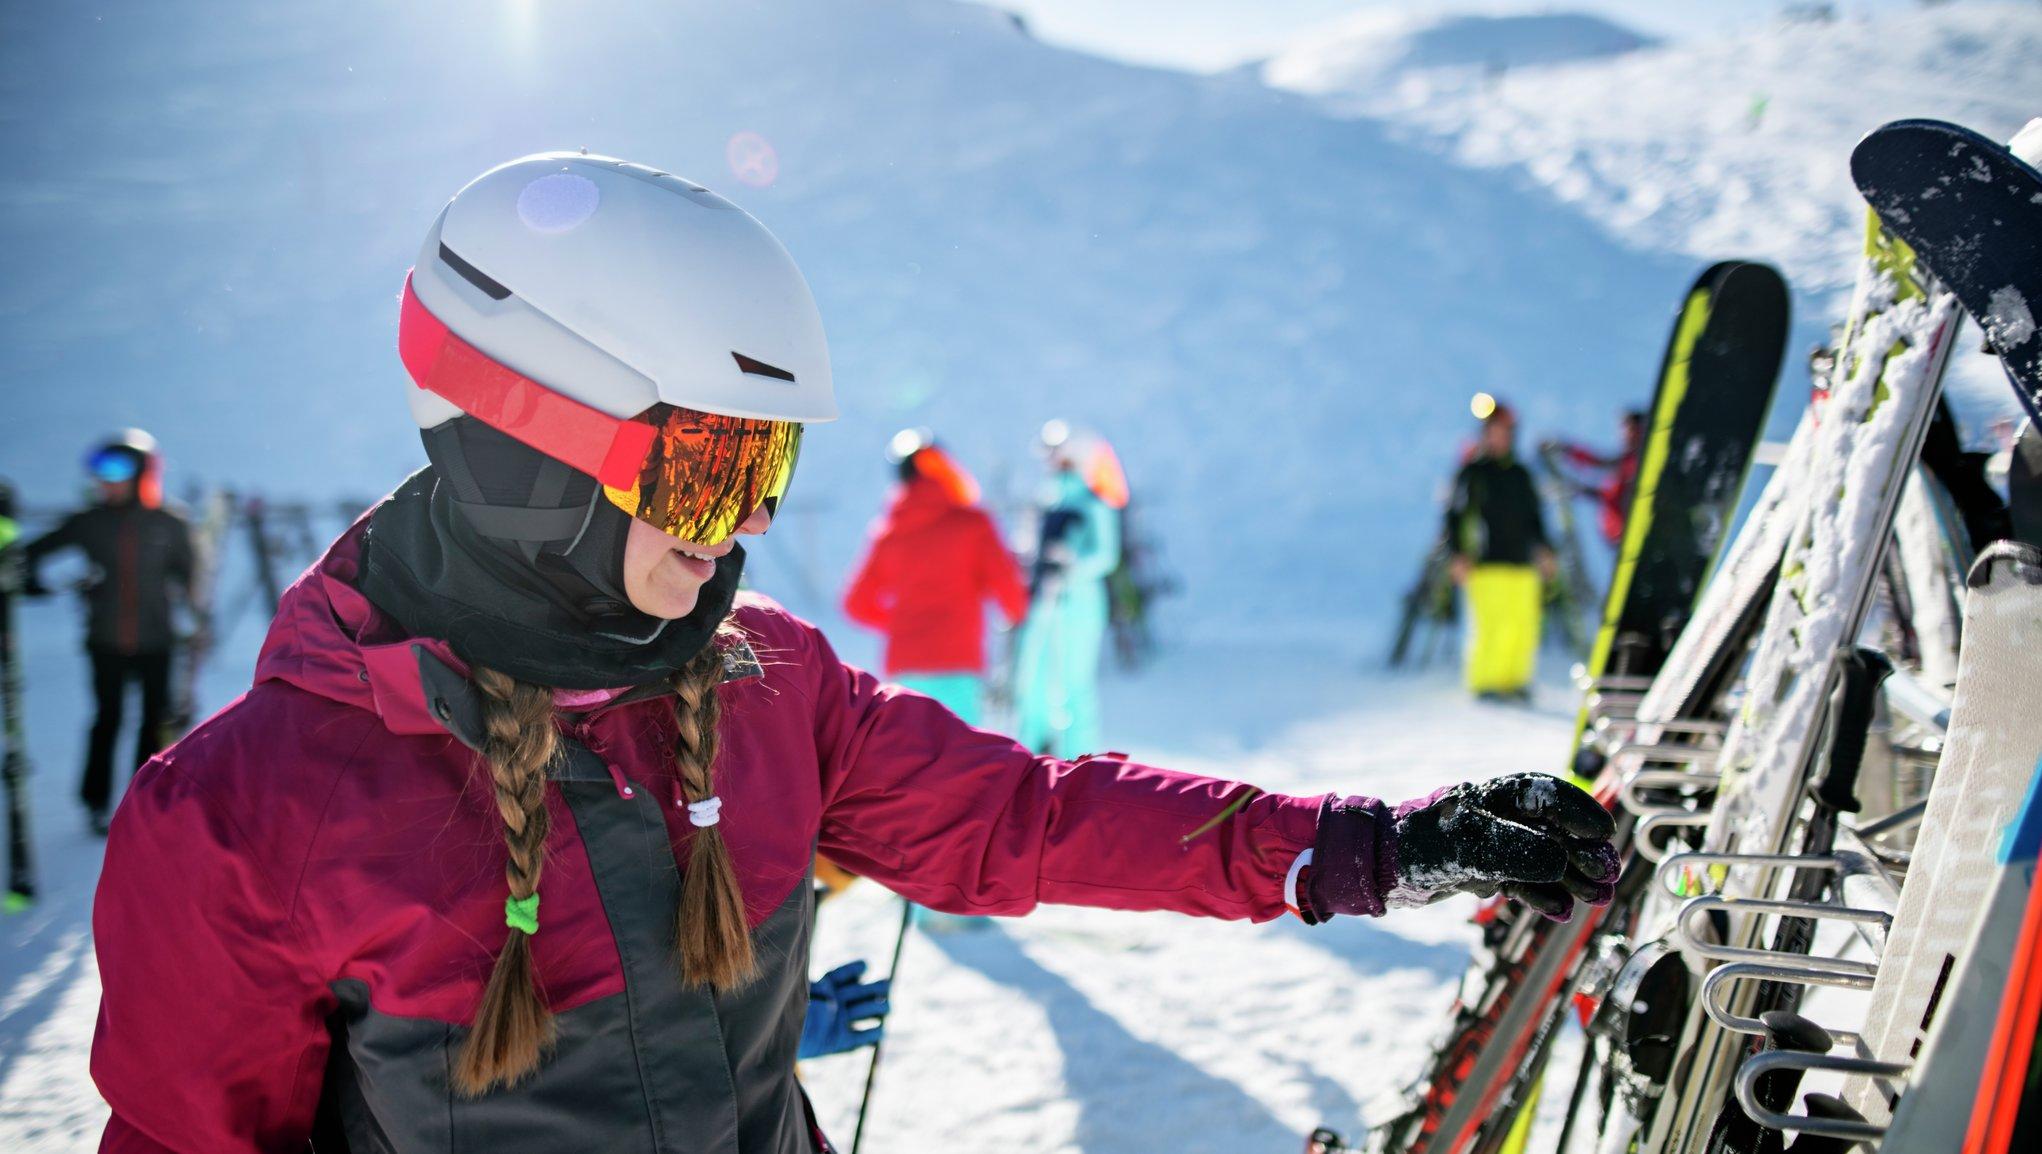 tjej sträcker sig efter skidor